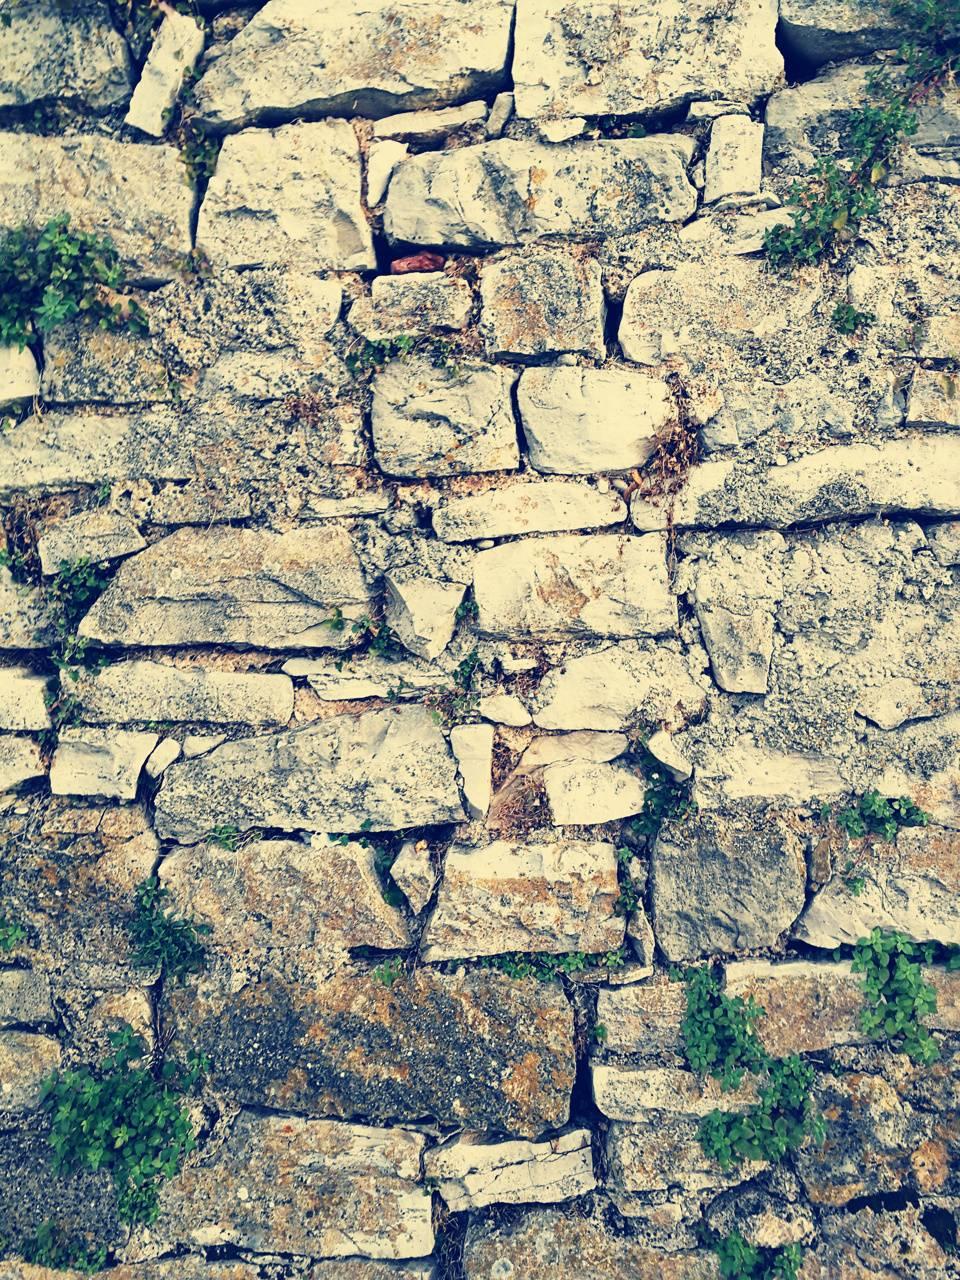 Wall from rocks 3